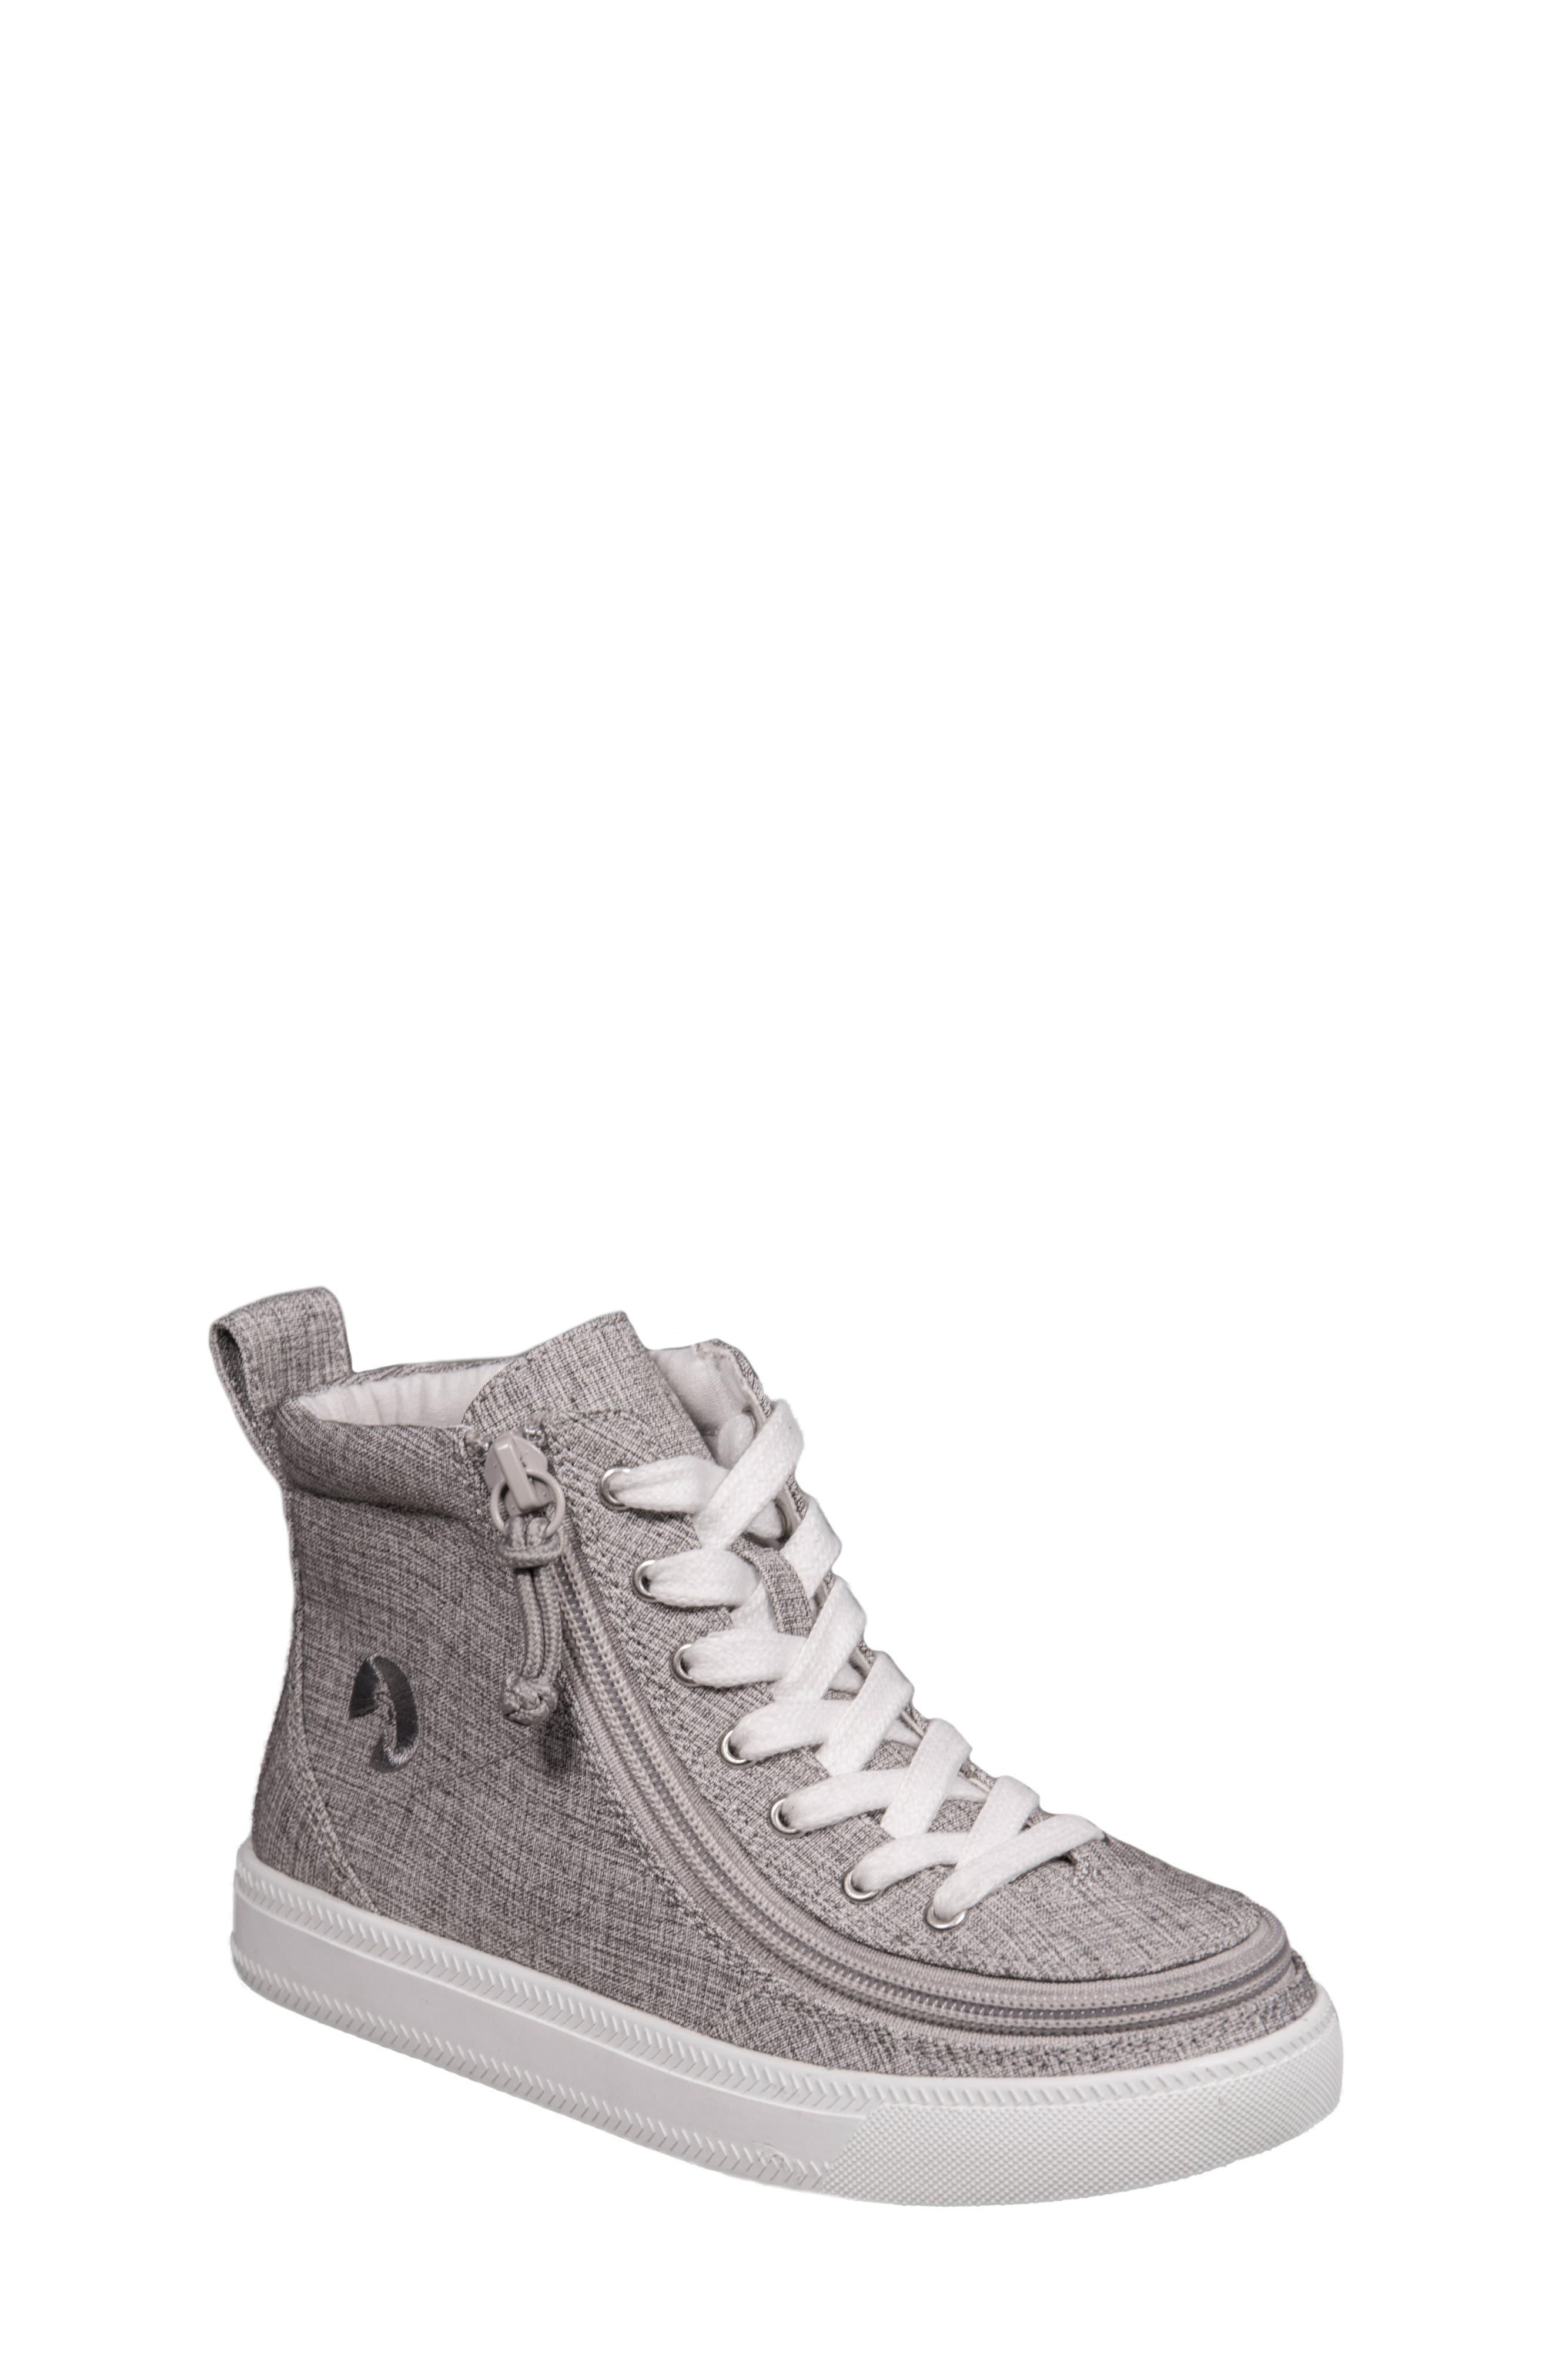 Zip Around High Top Sneaker,                             Main thumbnail 1, color,                             GREY JERSEY